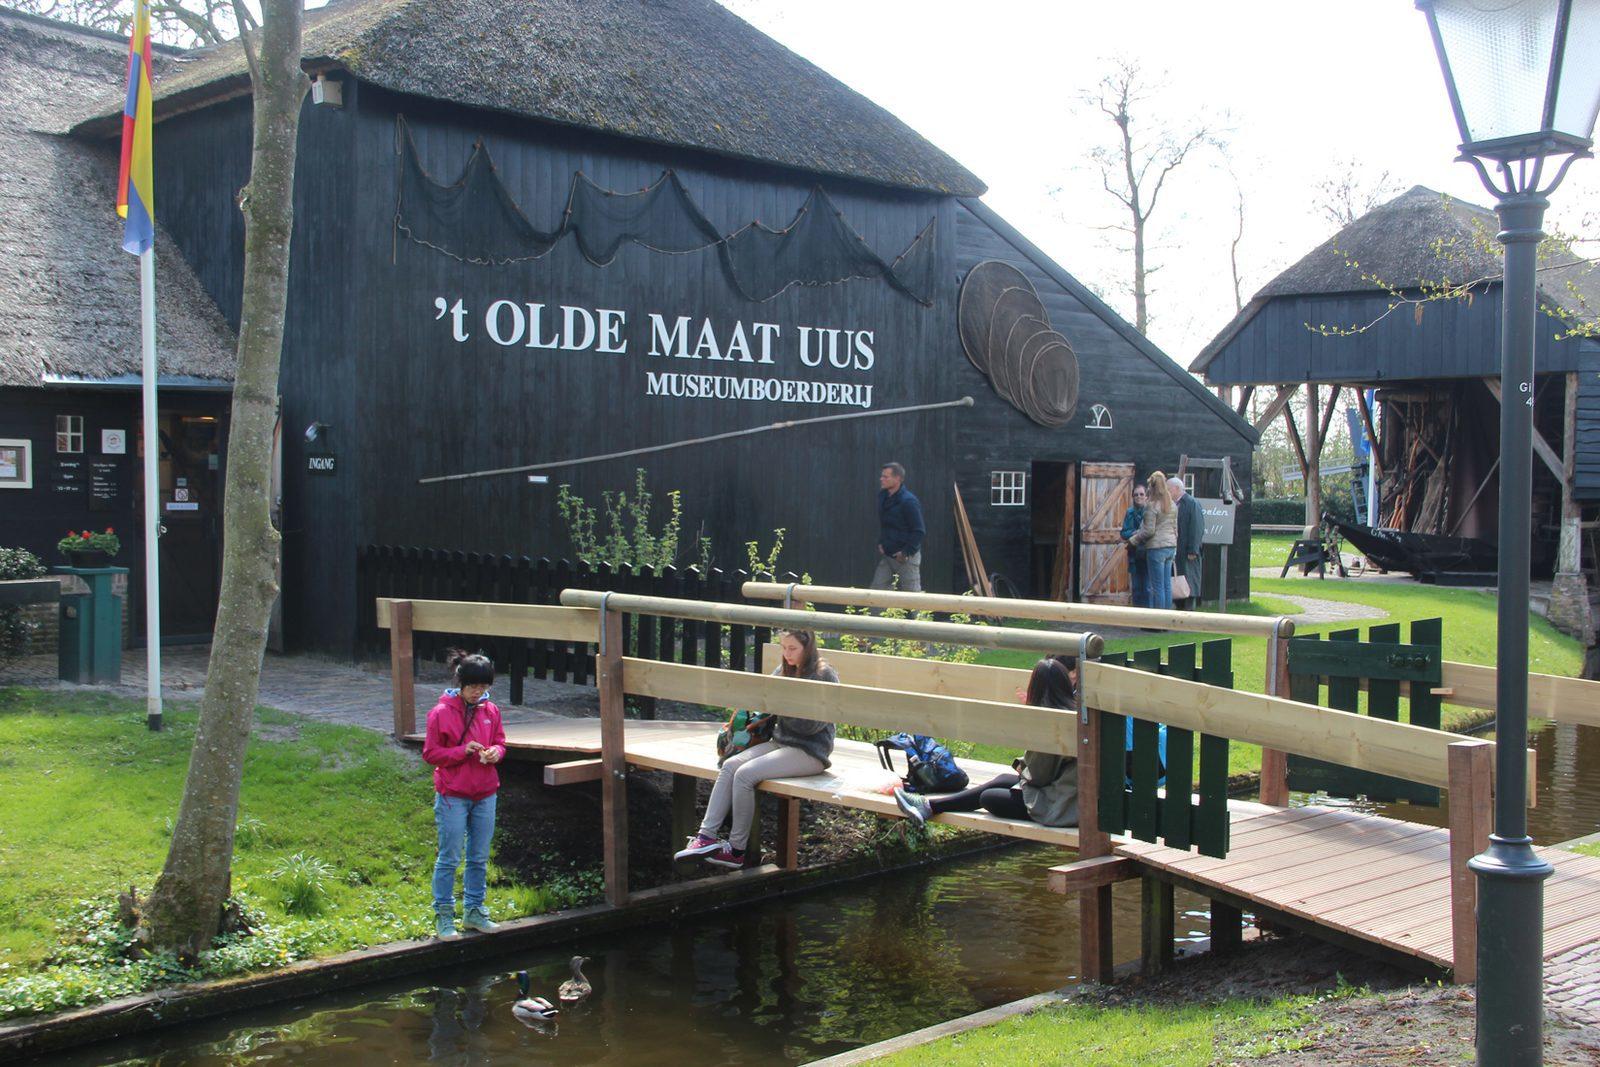 Museumboerderij 't Olde Maat Uus DoenvtrbMuseum